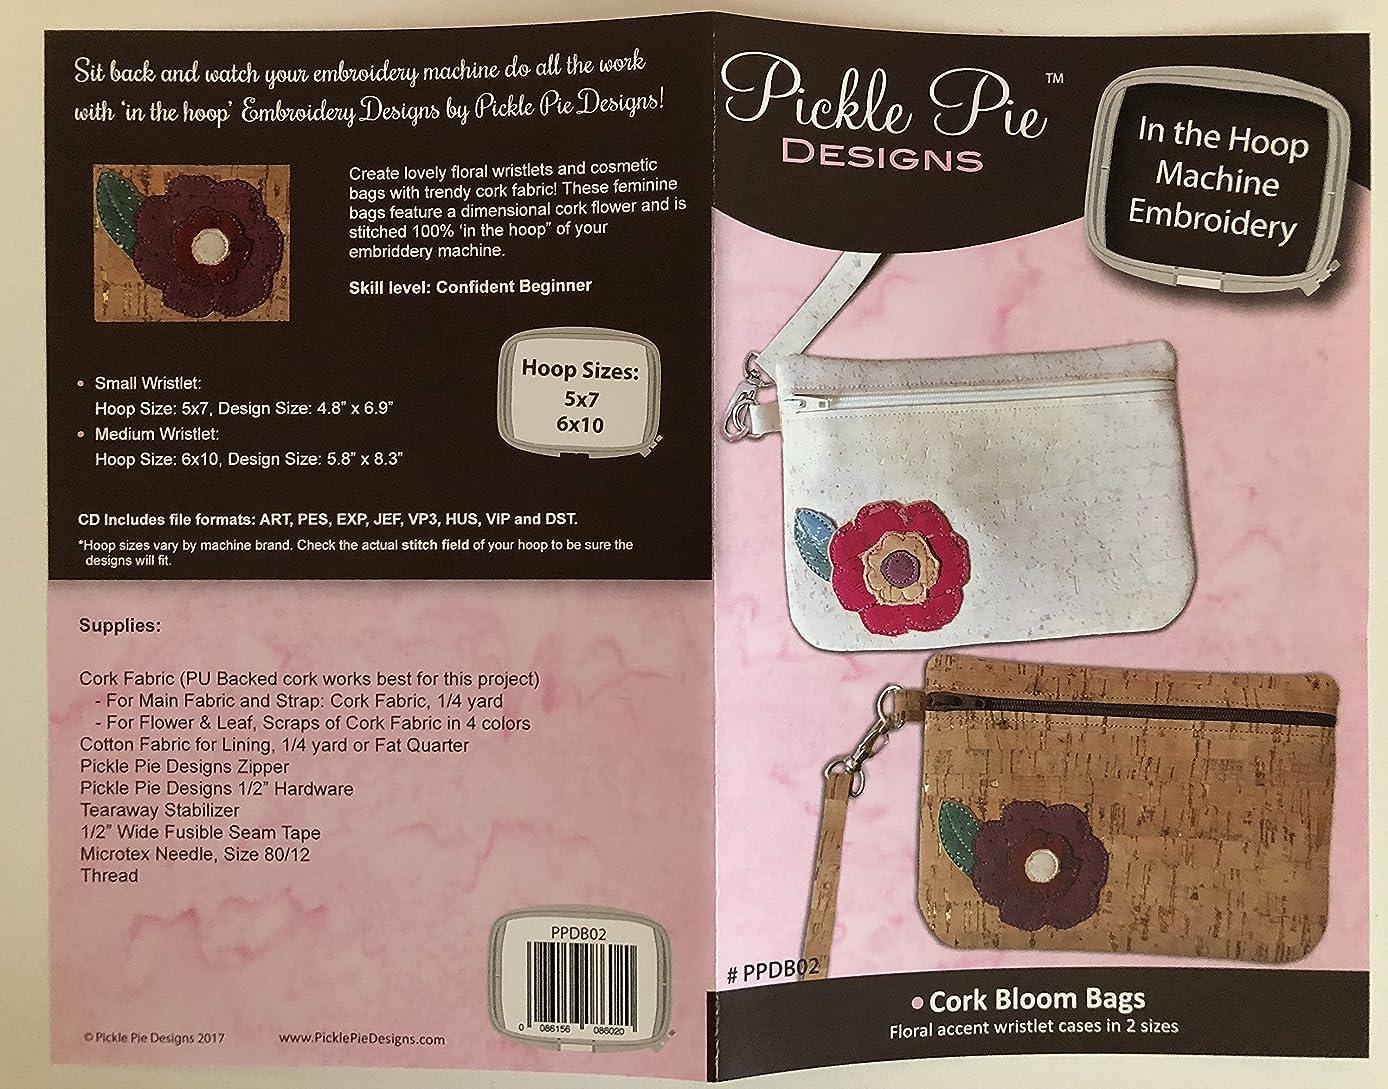 Pickle Pie Designs Machine Embroidery Designs Cork Bloom Bags